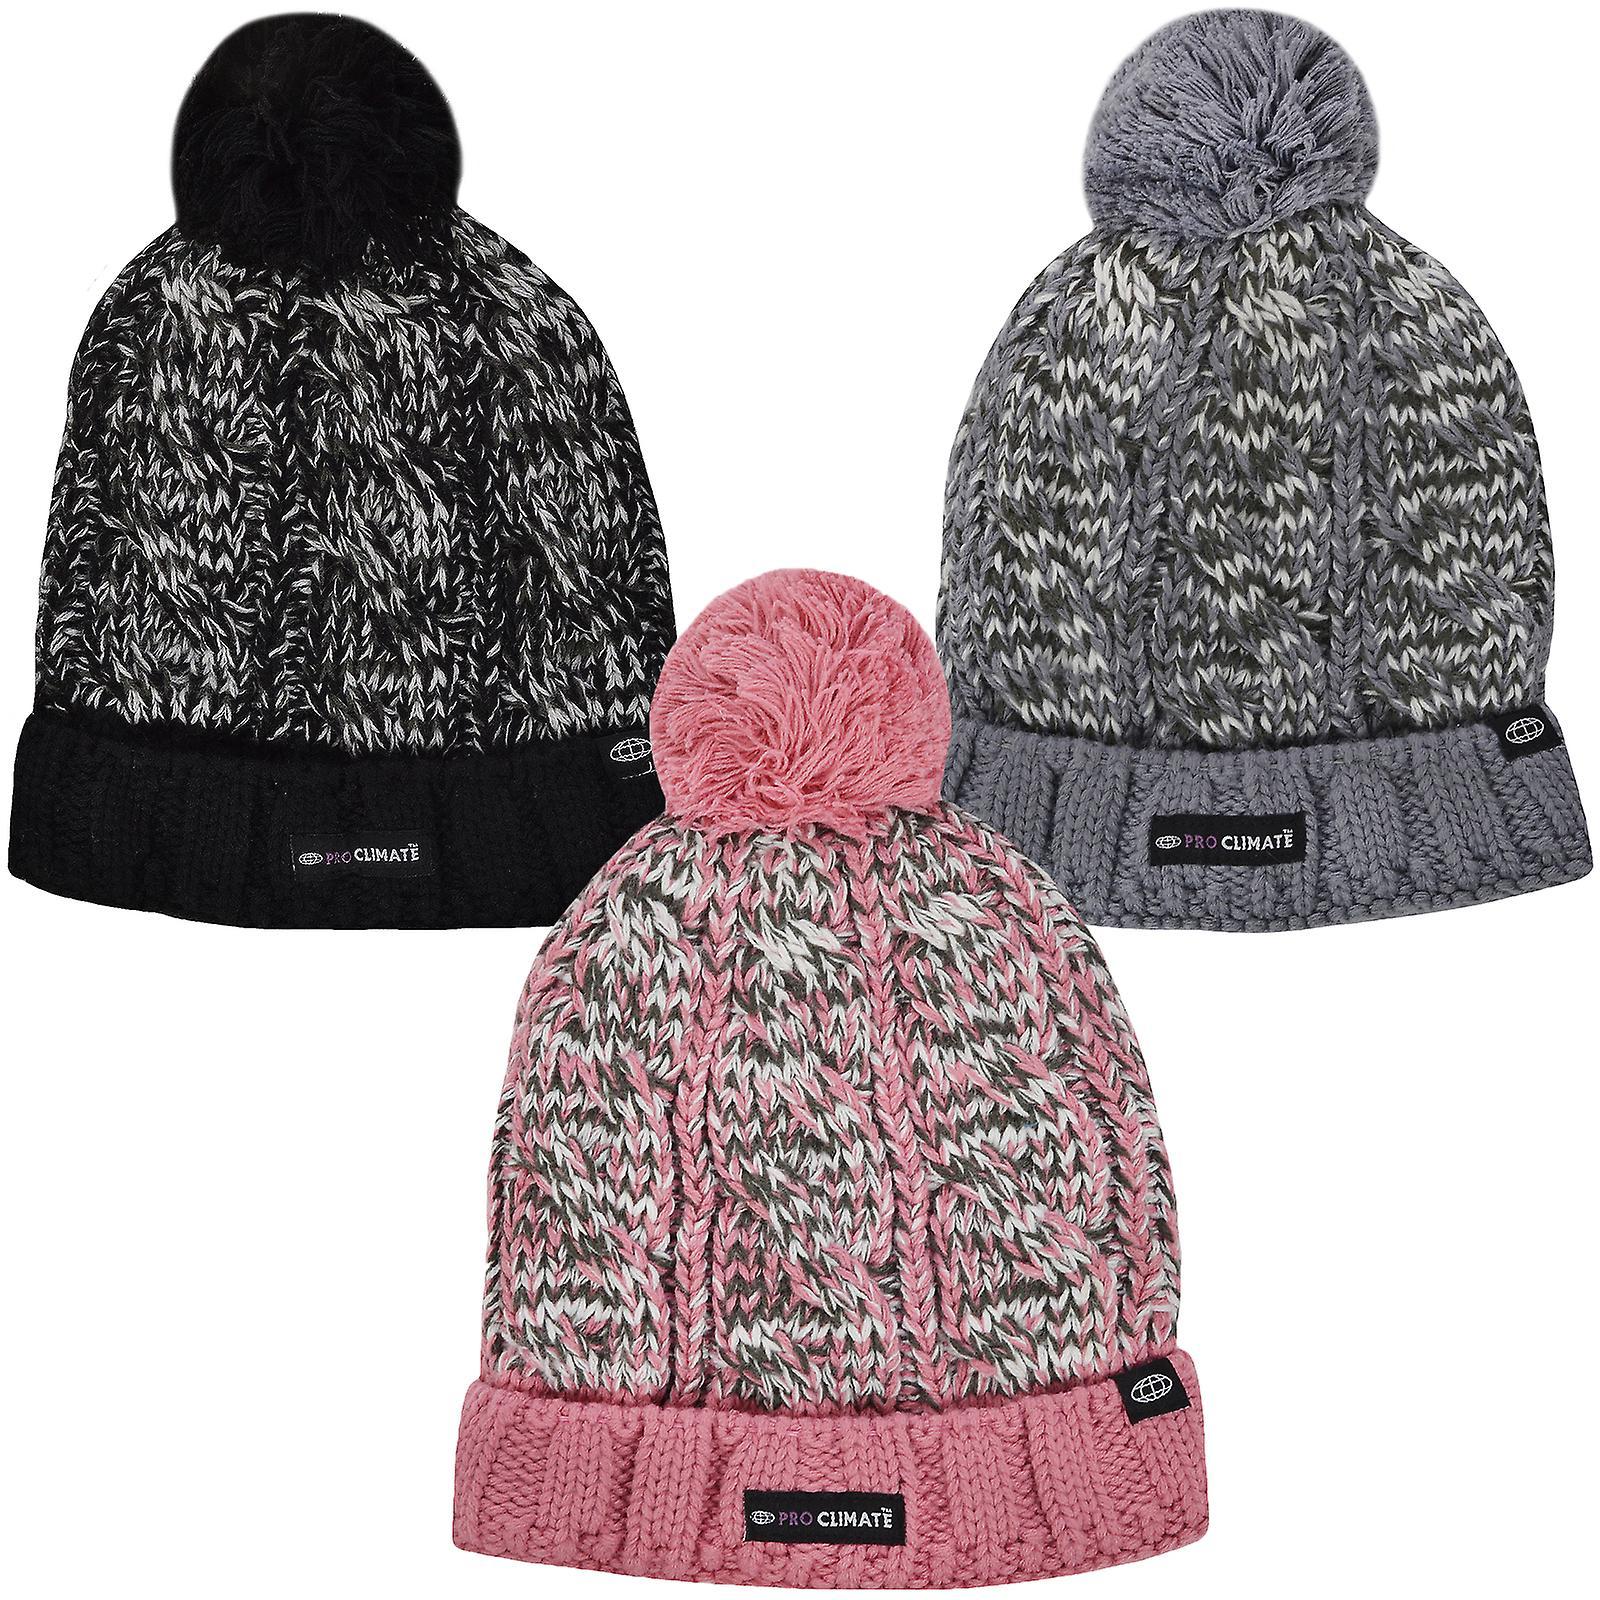 06dda5604a7 ProClimate Waterproof Thinsulate Winter Chunky Knit Pom Bobble Hat Beanie